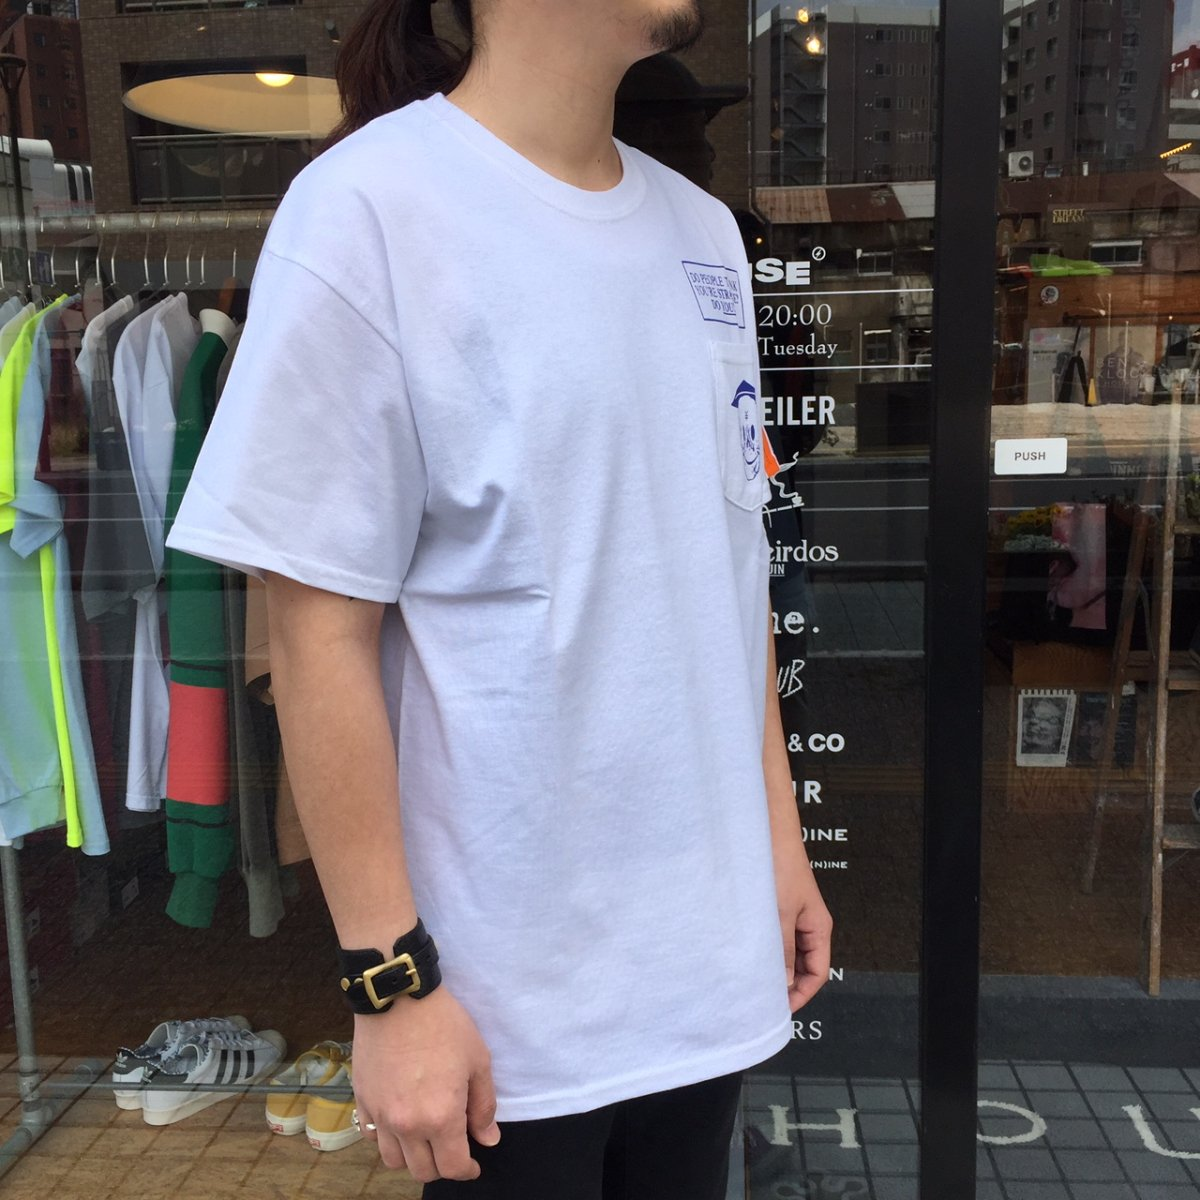 <img class='new_mark_img1' src='https://img.shop-pro.jp/img/new/icons3.gif' style='border:none;display:inline;margin:0px;padding:0px;width:auto;' />Black Weirdos  ブラック ウィドー / Tシャツ PSYCHIC BW Pocket Tee 【WHITE】